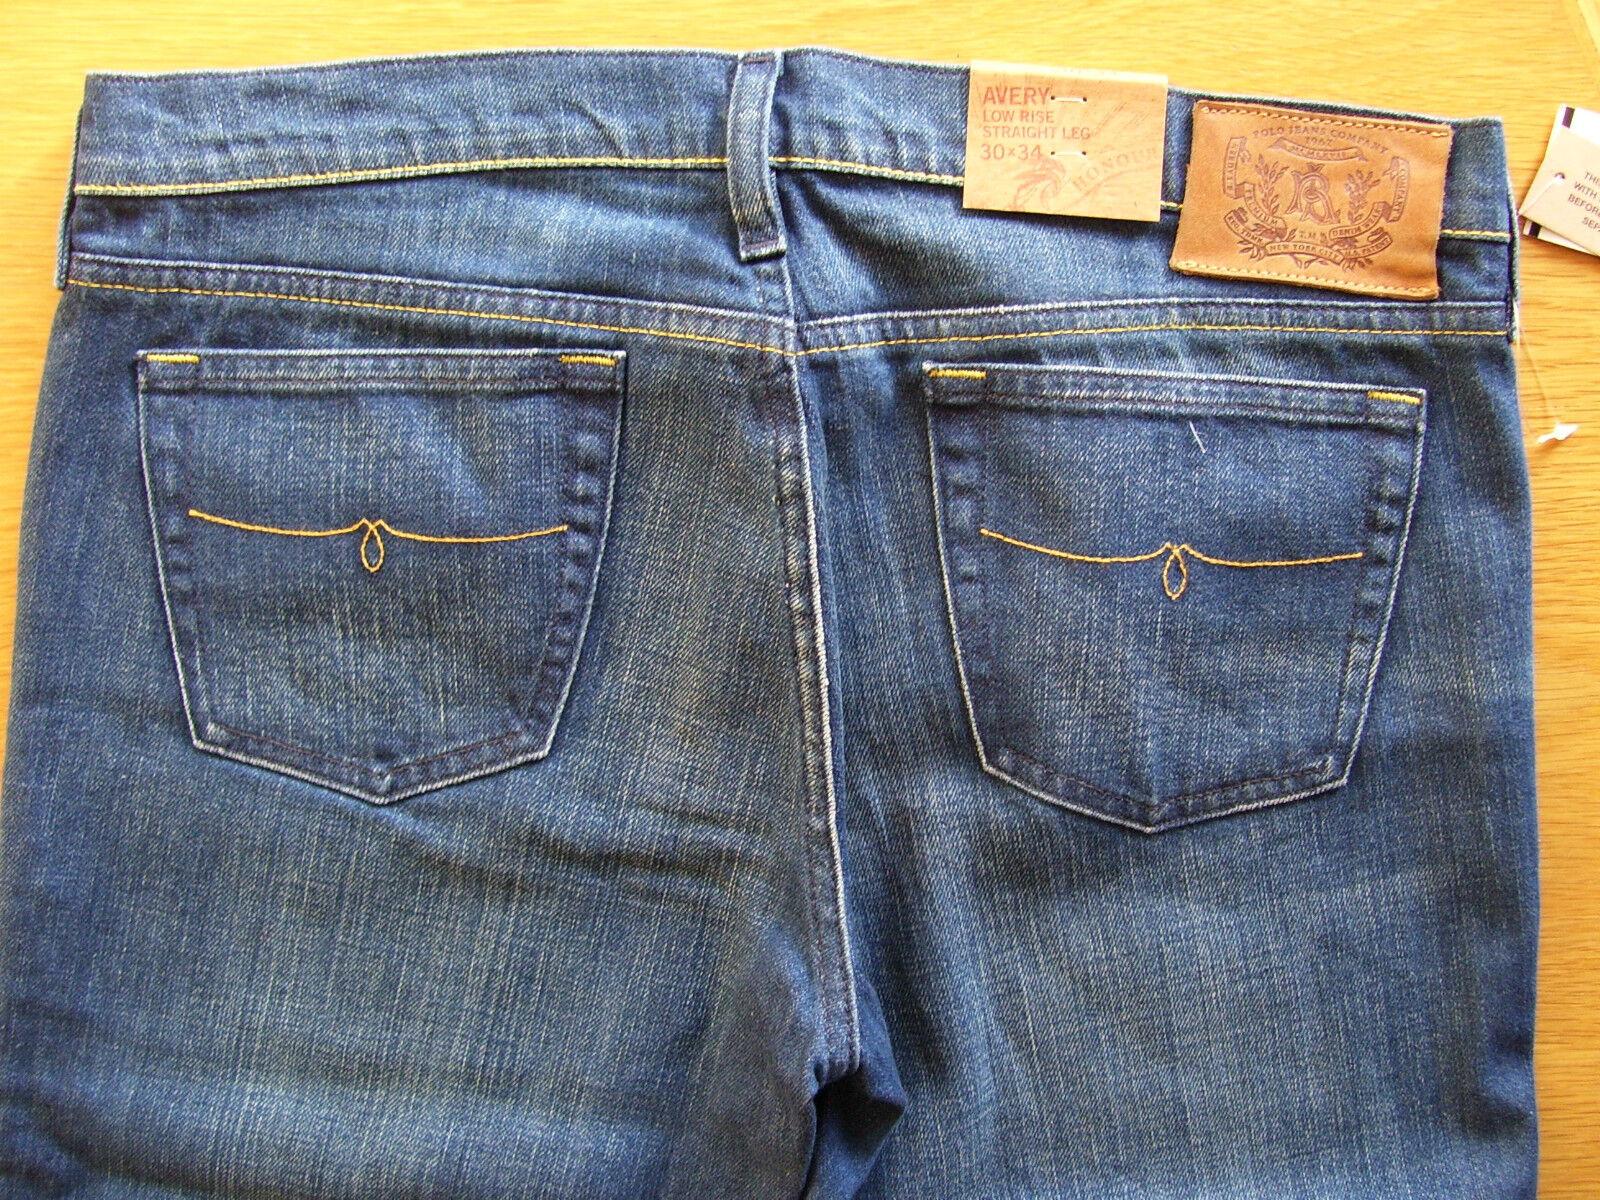 Polo by Ralph Lauren Damen Jeans Hose Avery Avery Avery blau used wash W29 L34 neu d30af1